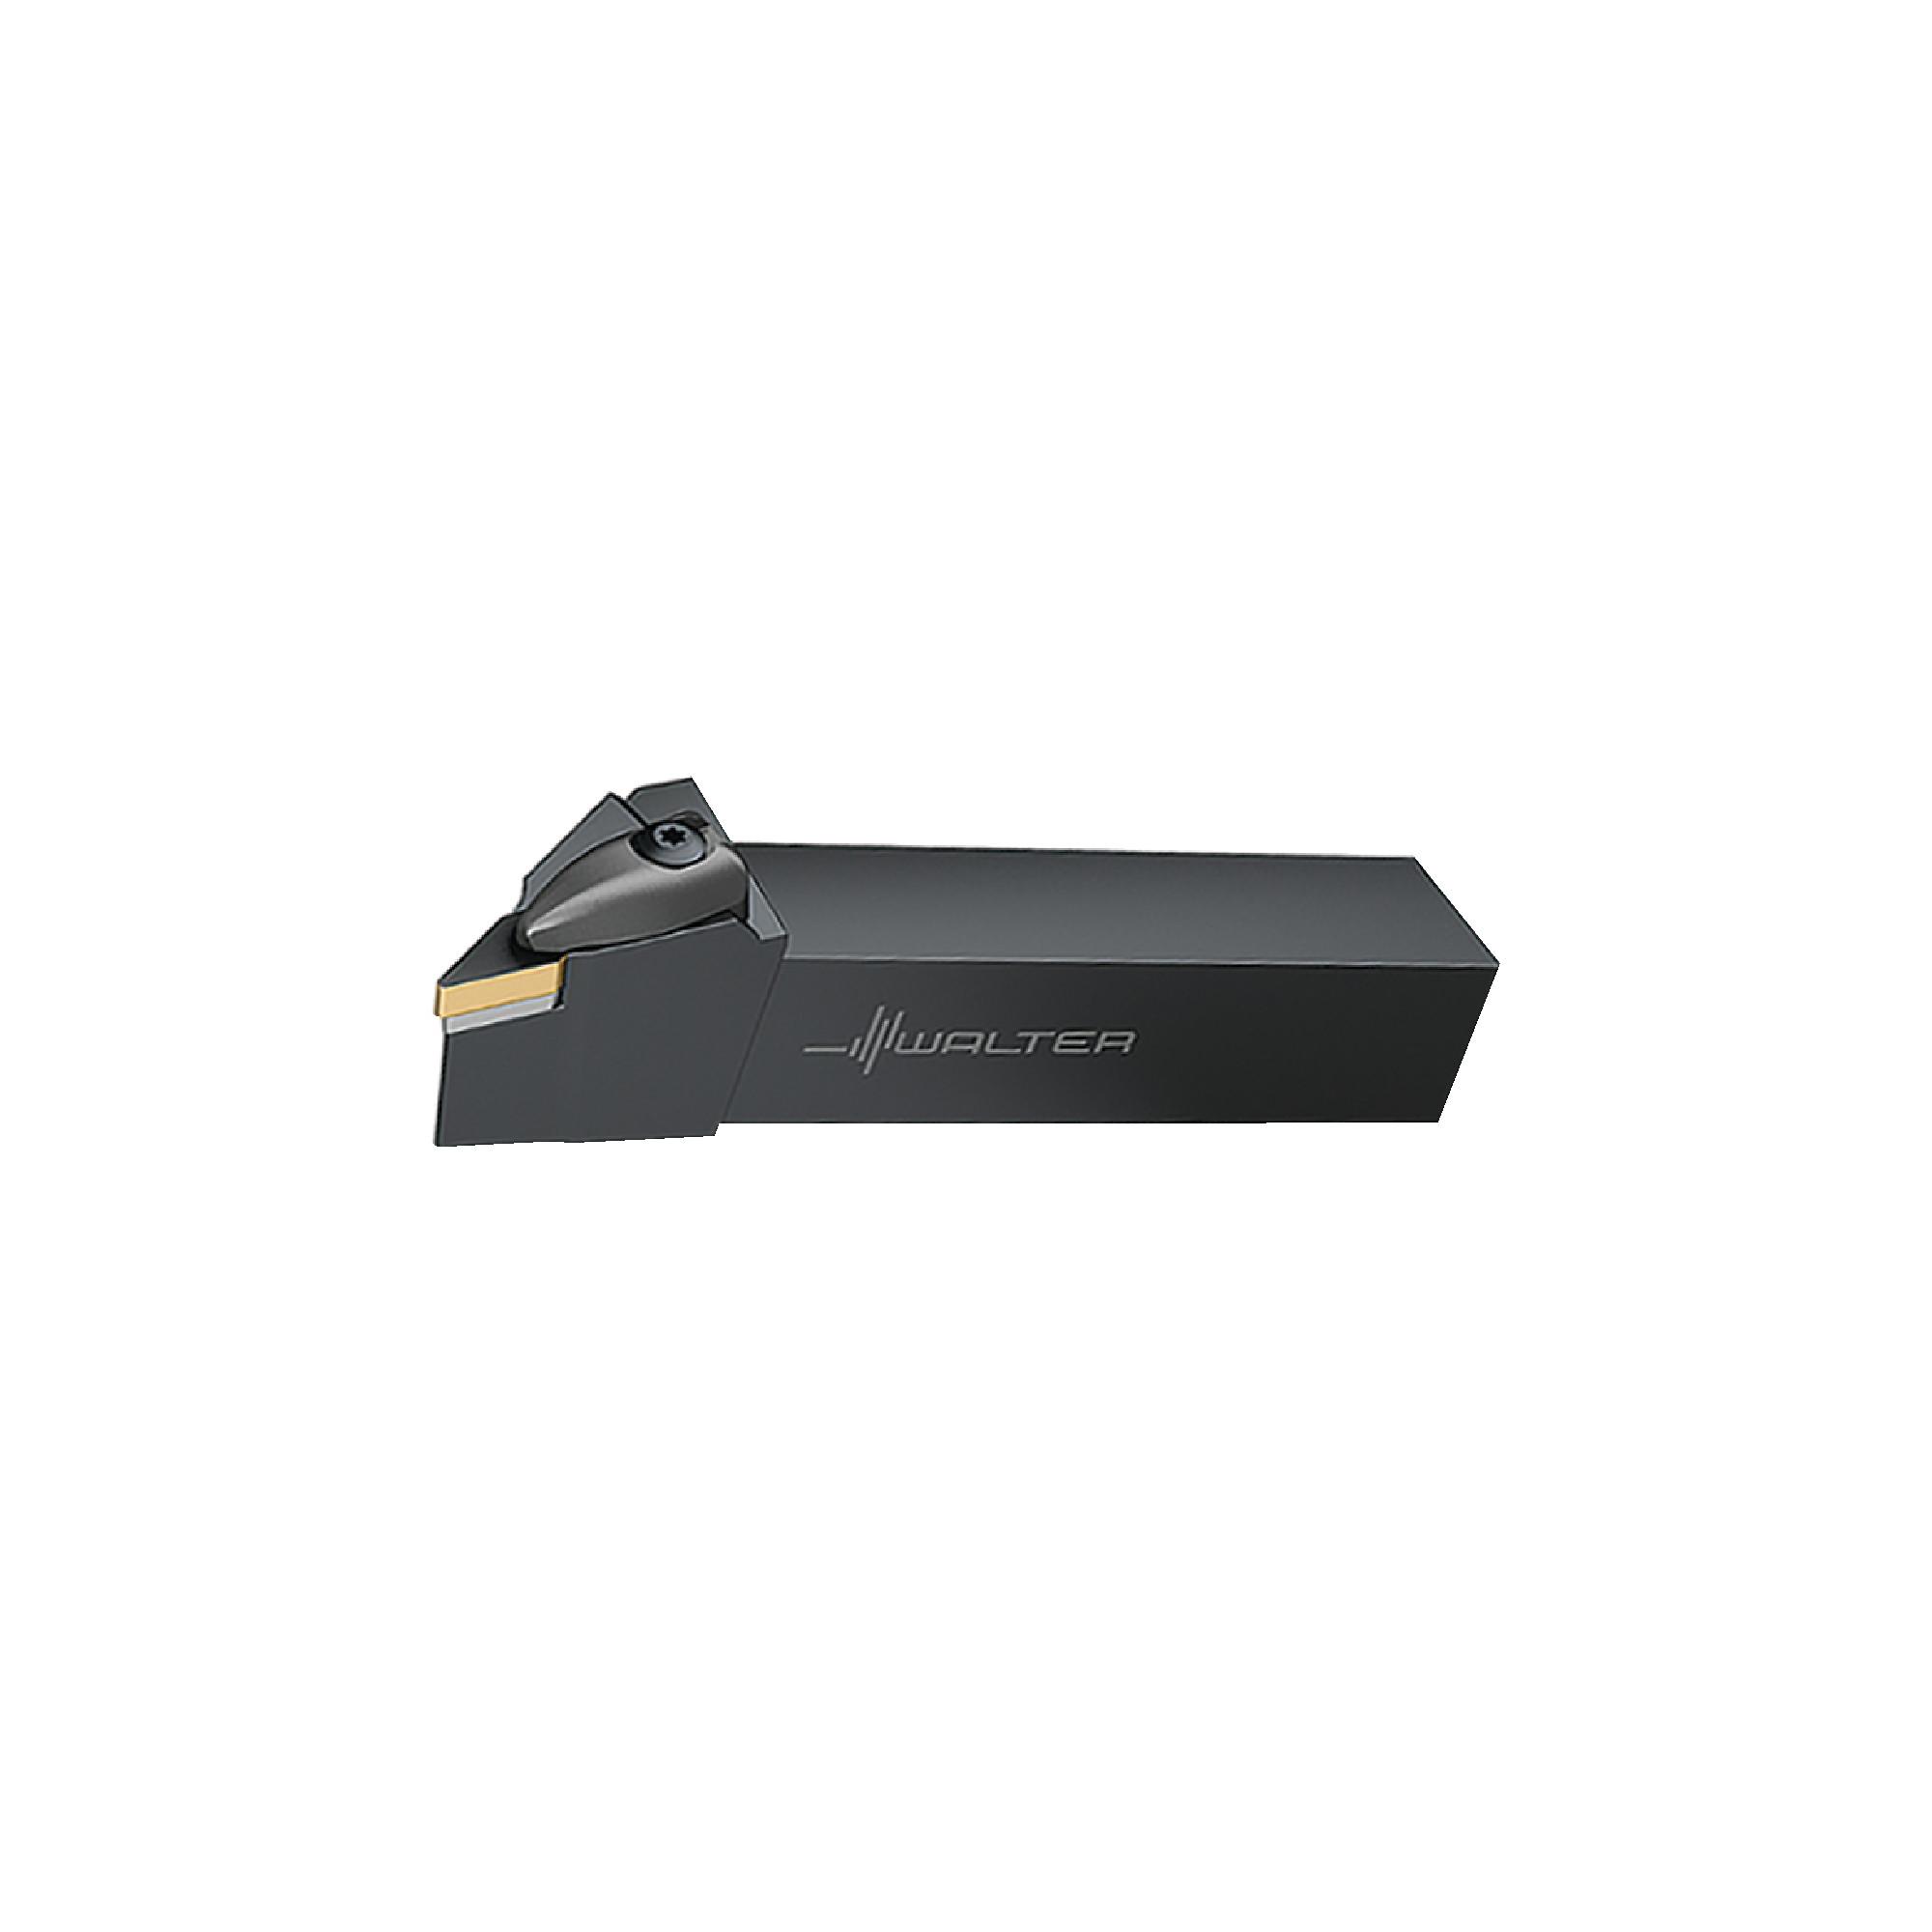 "WALTER - DVJNR12-3B / 0.750"" External Tool Holder for VNMG33_ Inserts / Right Hand"